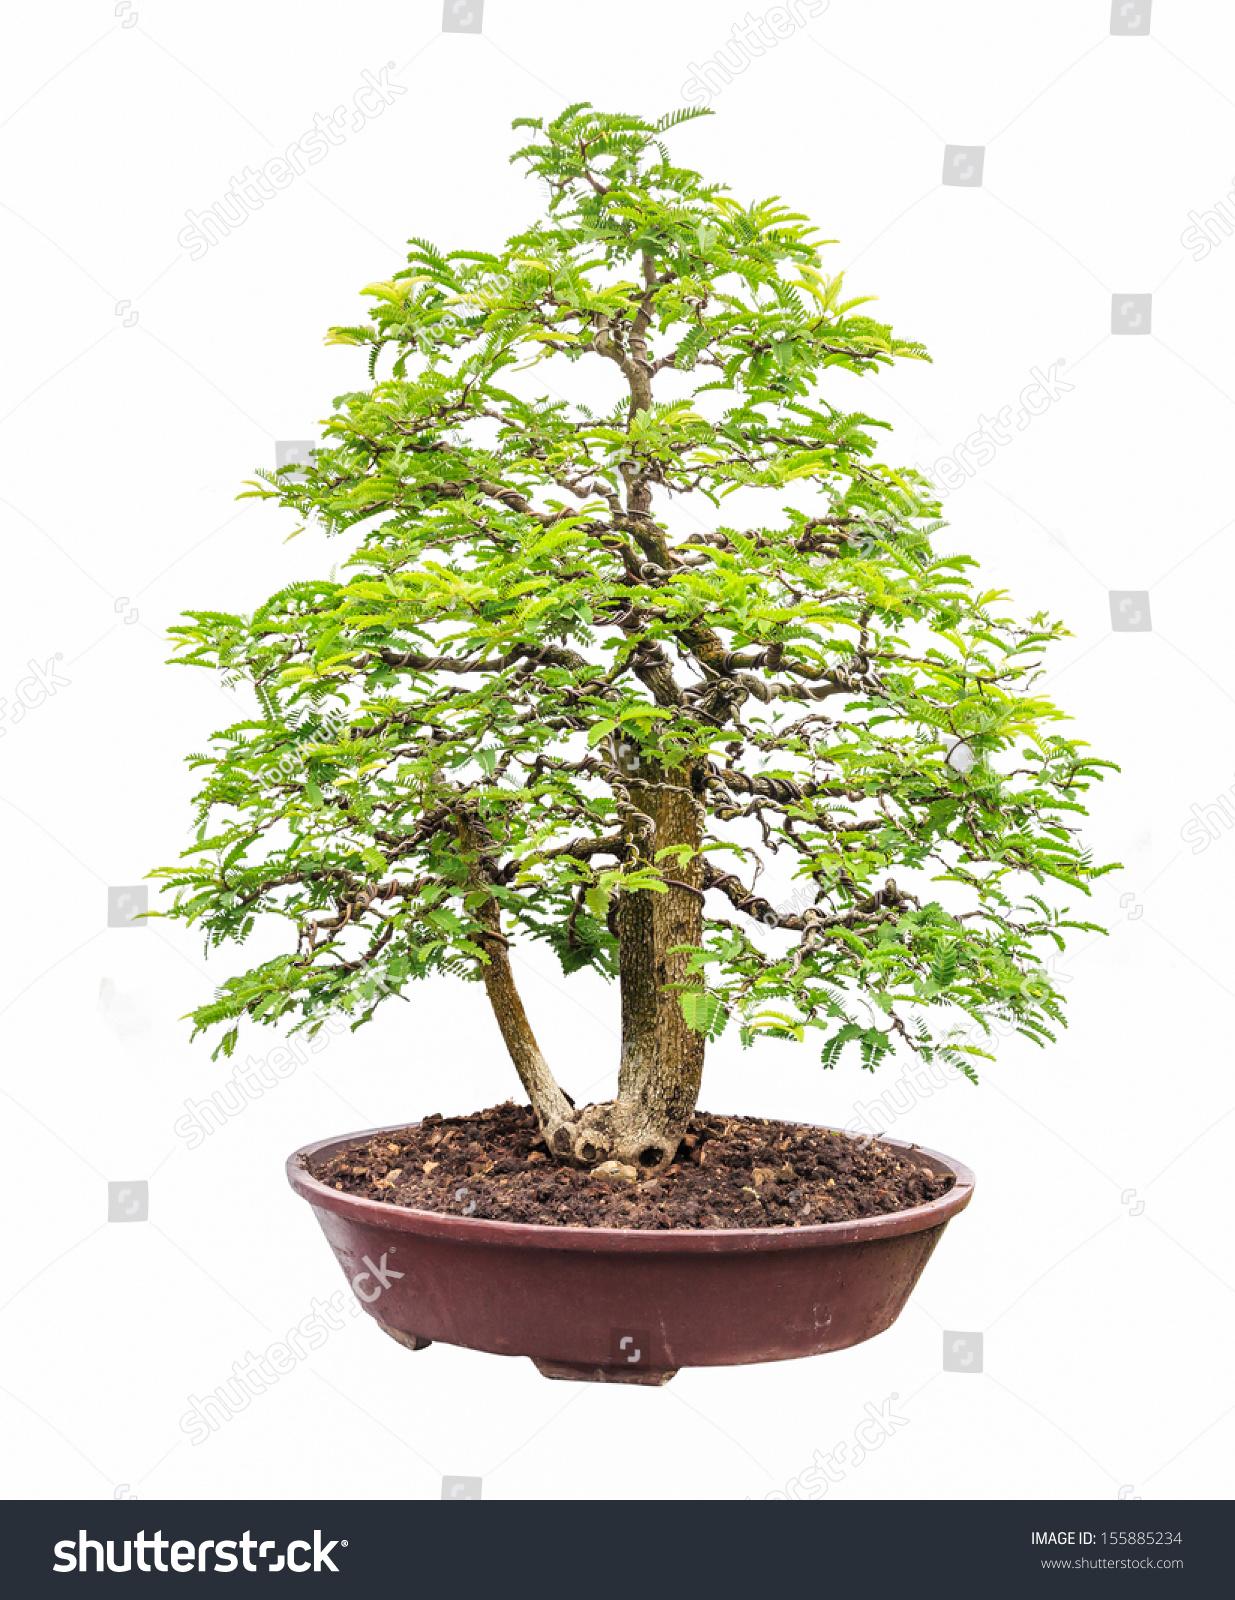 tamarind tree bonsai isolated on white stock photo, Beautiful flower